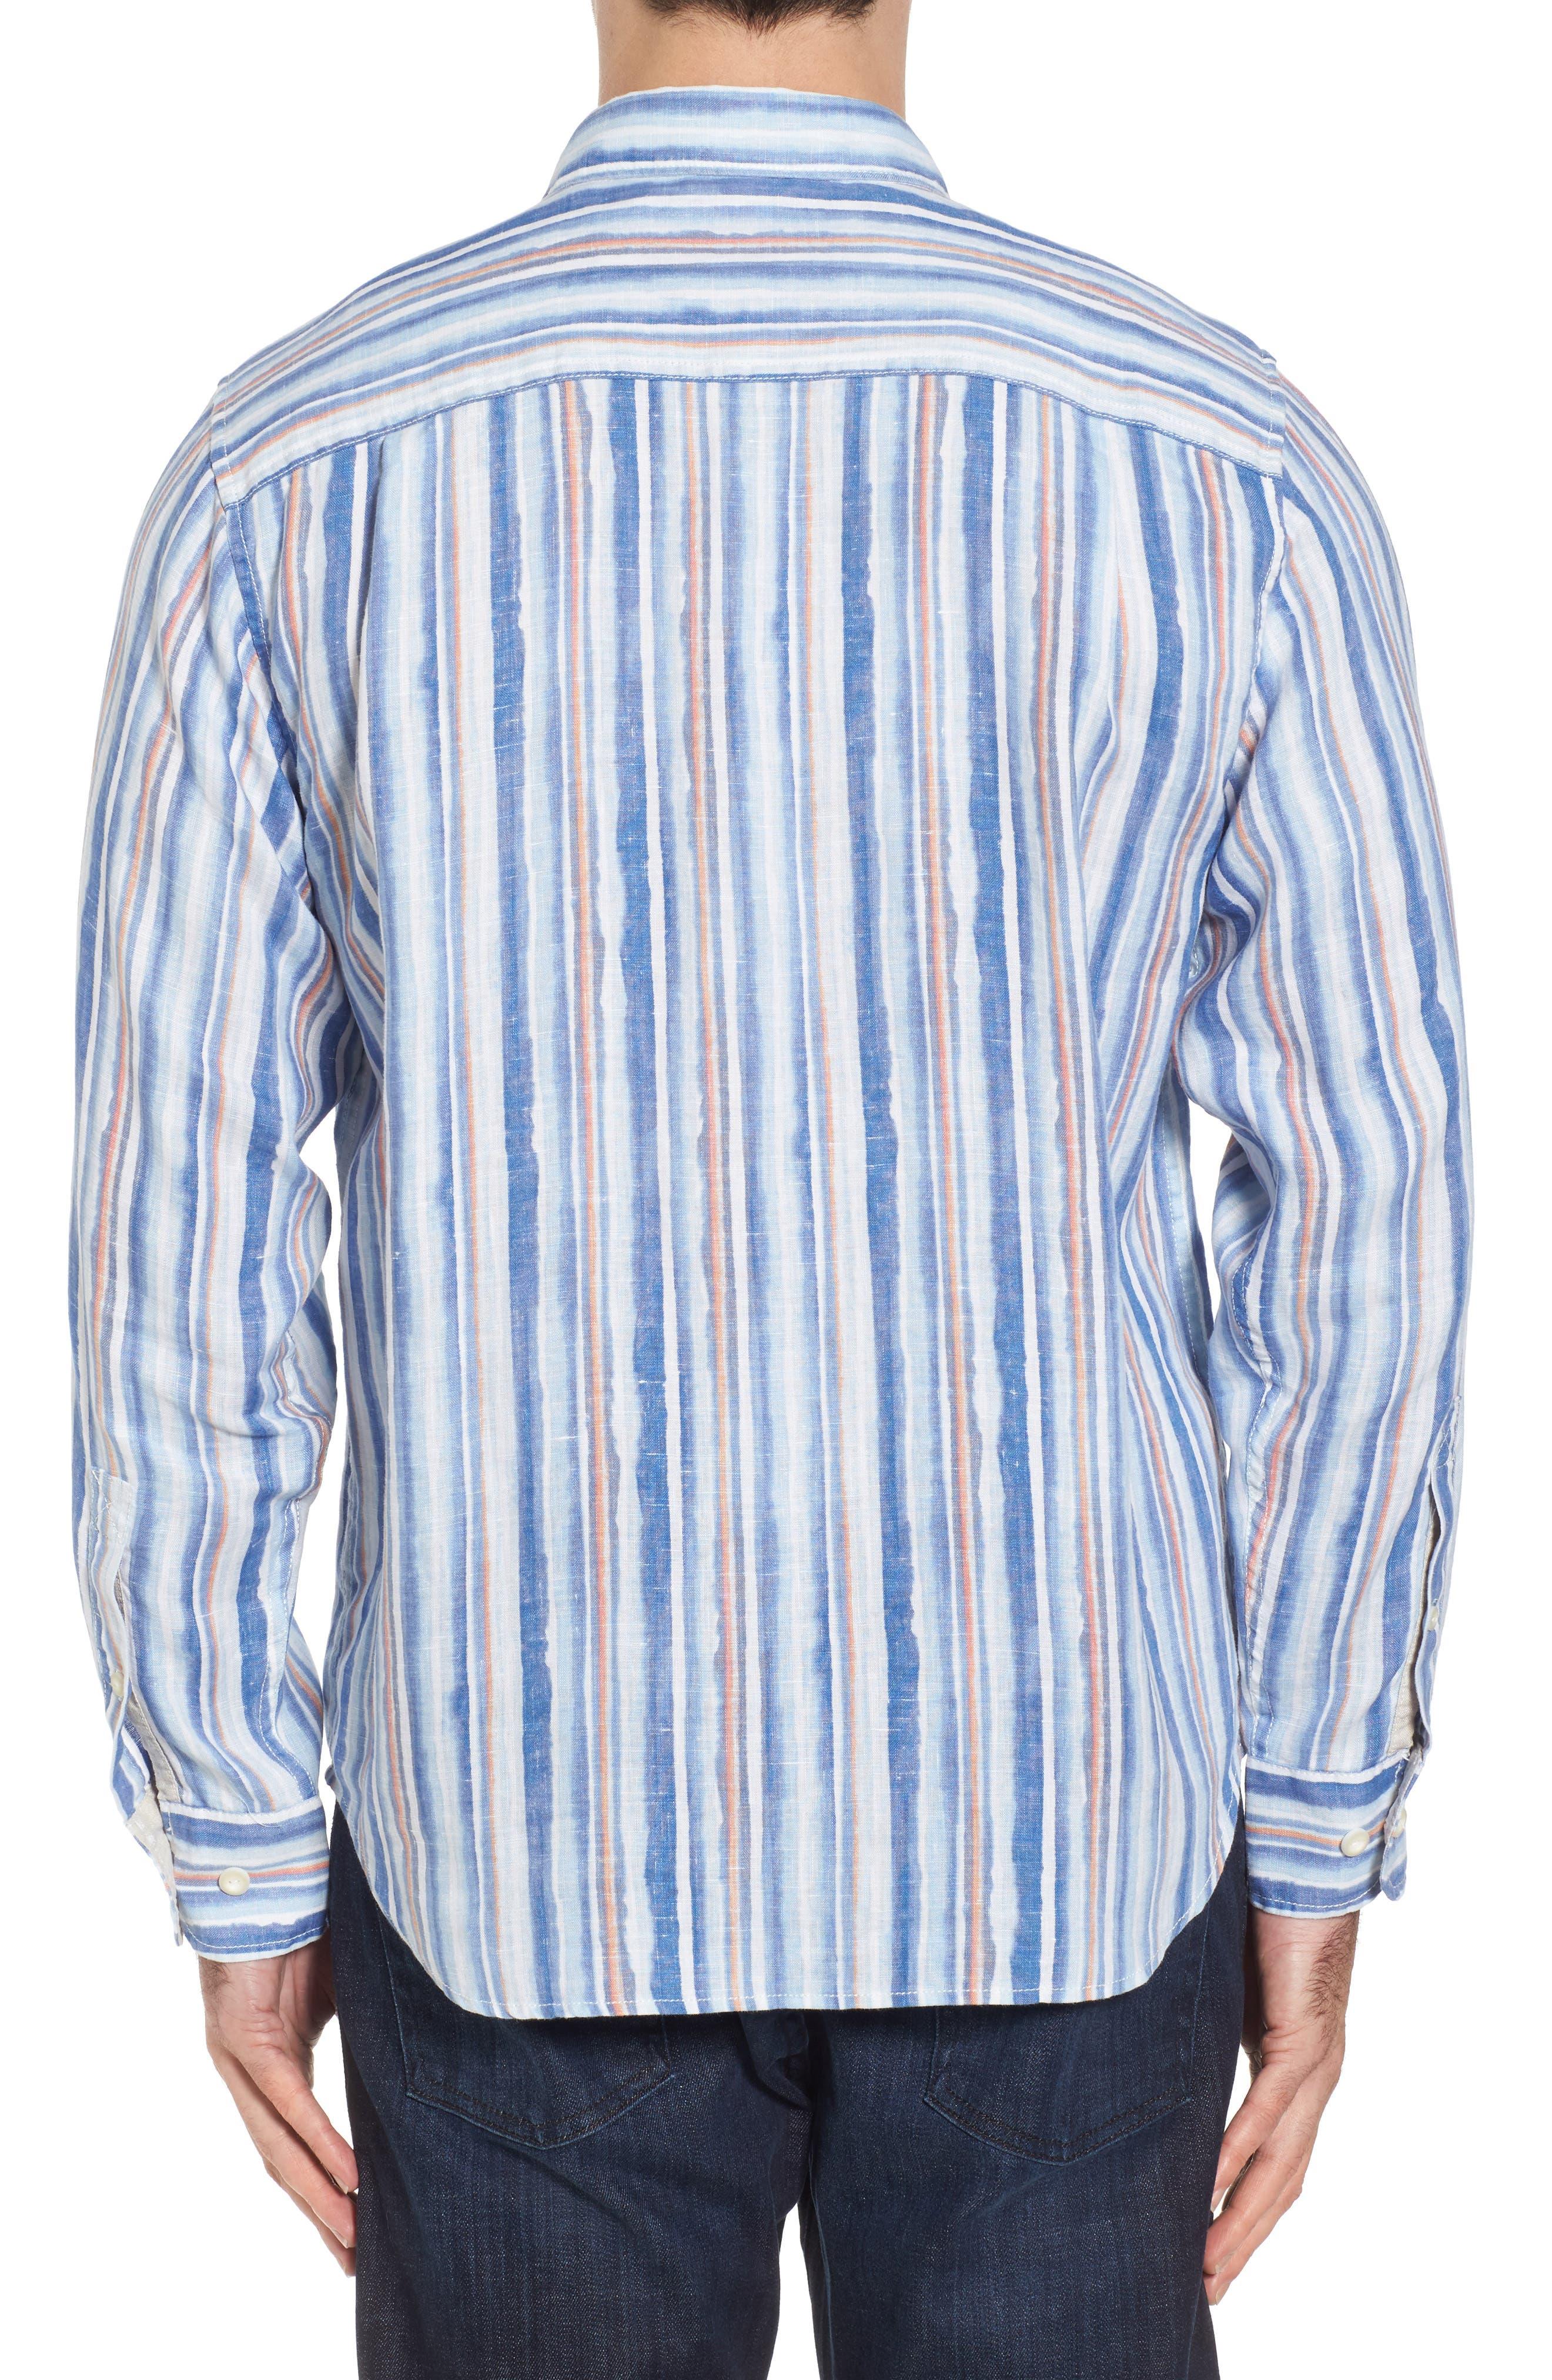 Watercrest Stripe Linen Sport Shirt,                             Alternate thumbnail 2, color,                             Cobalt Sea